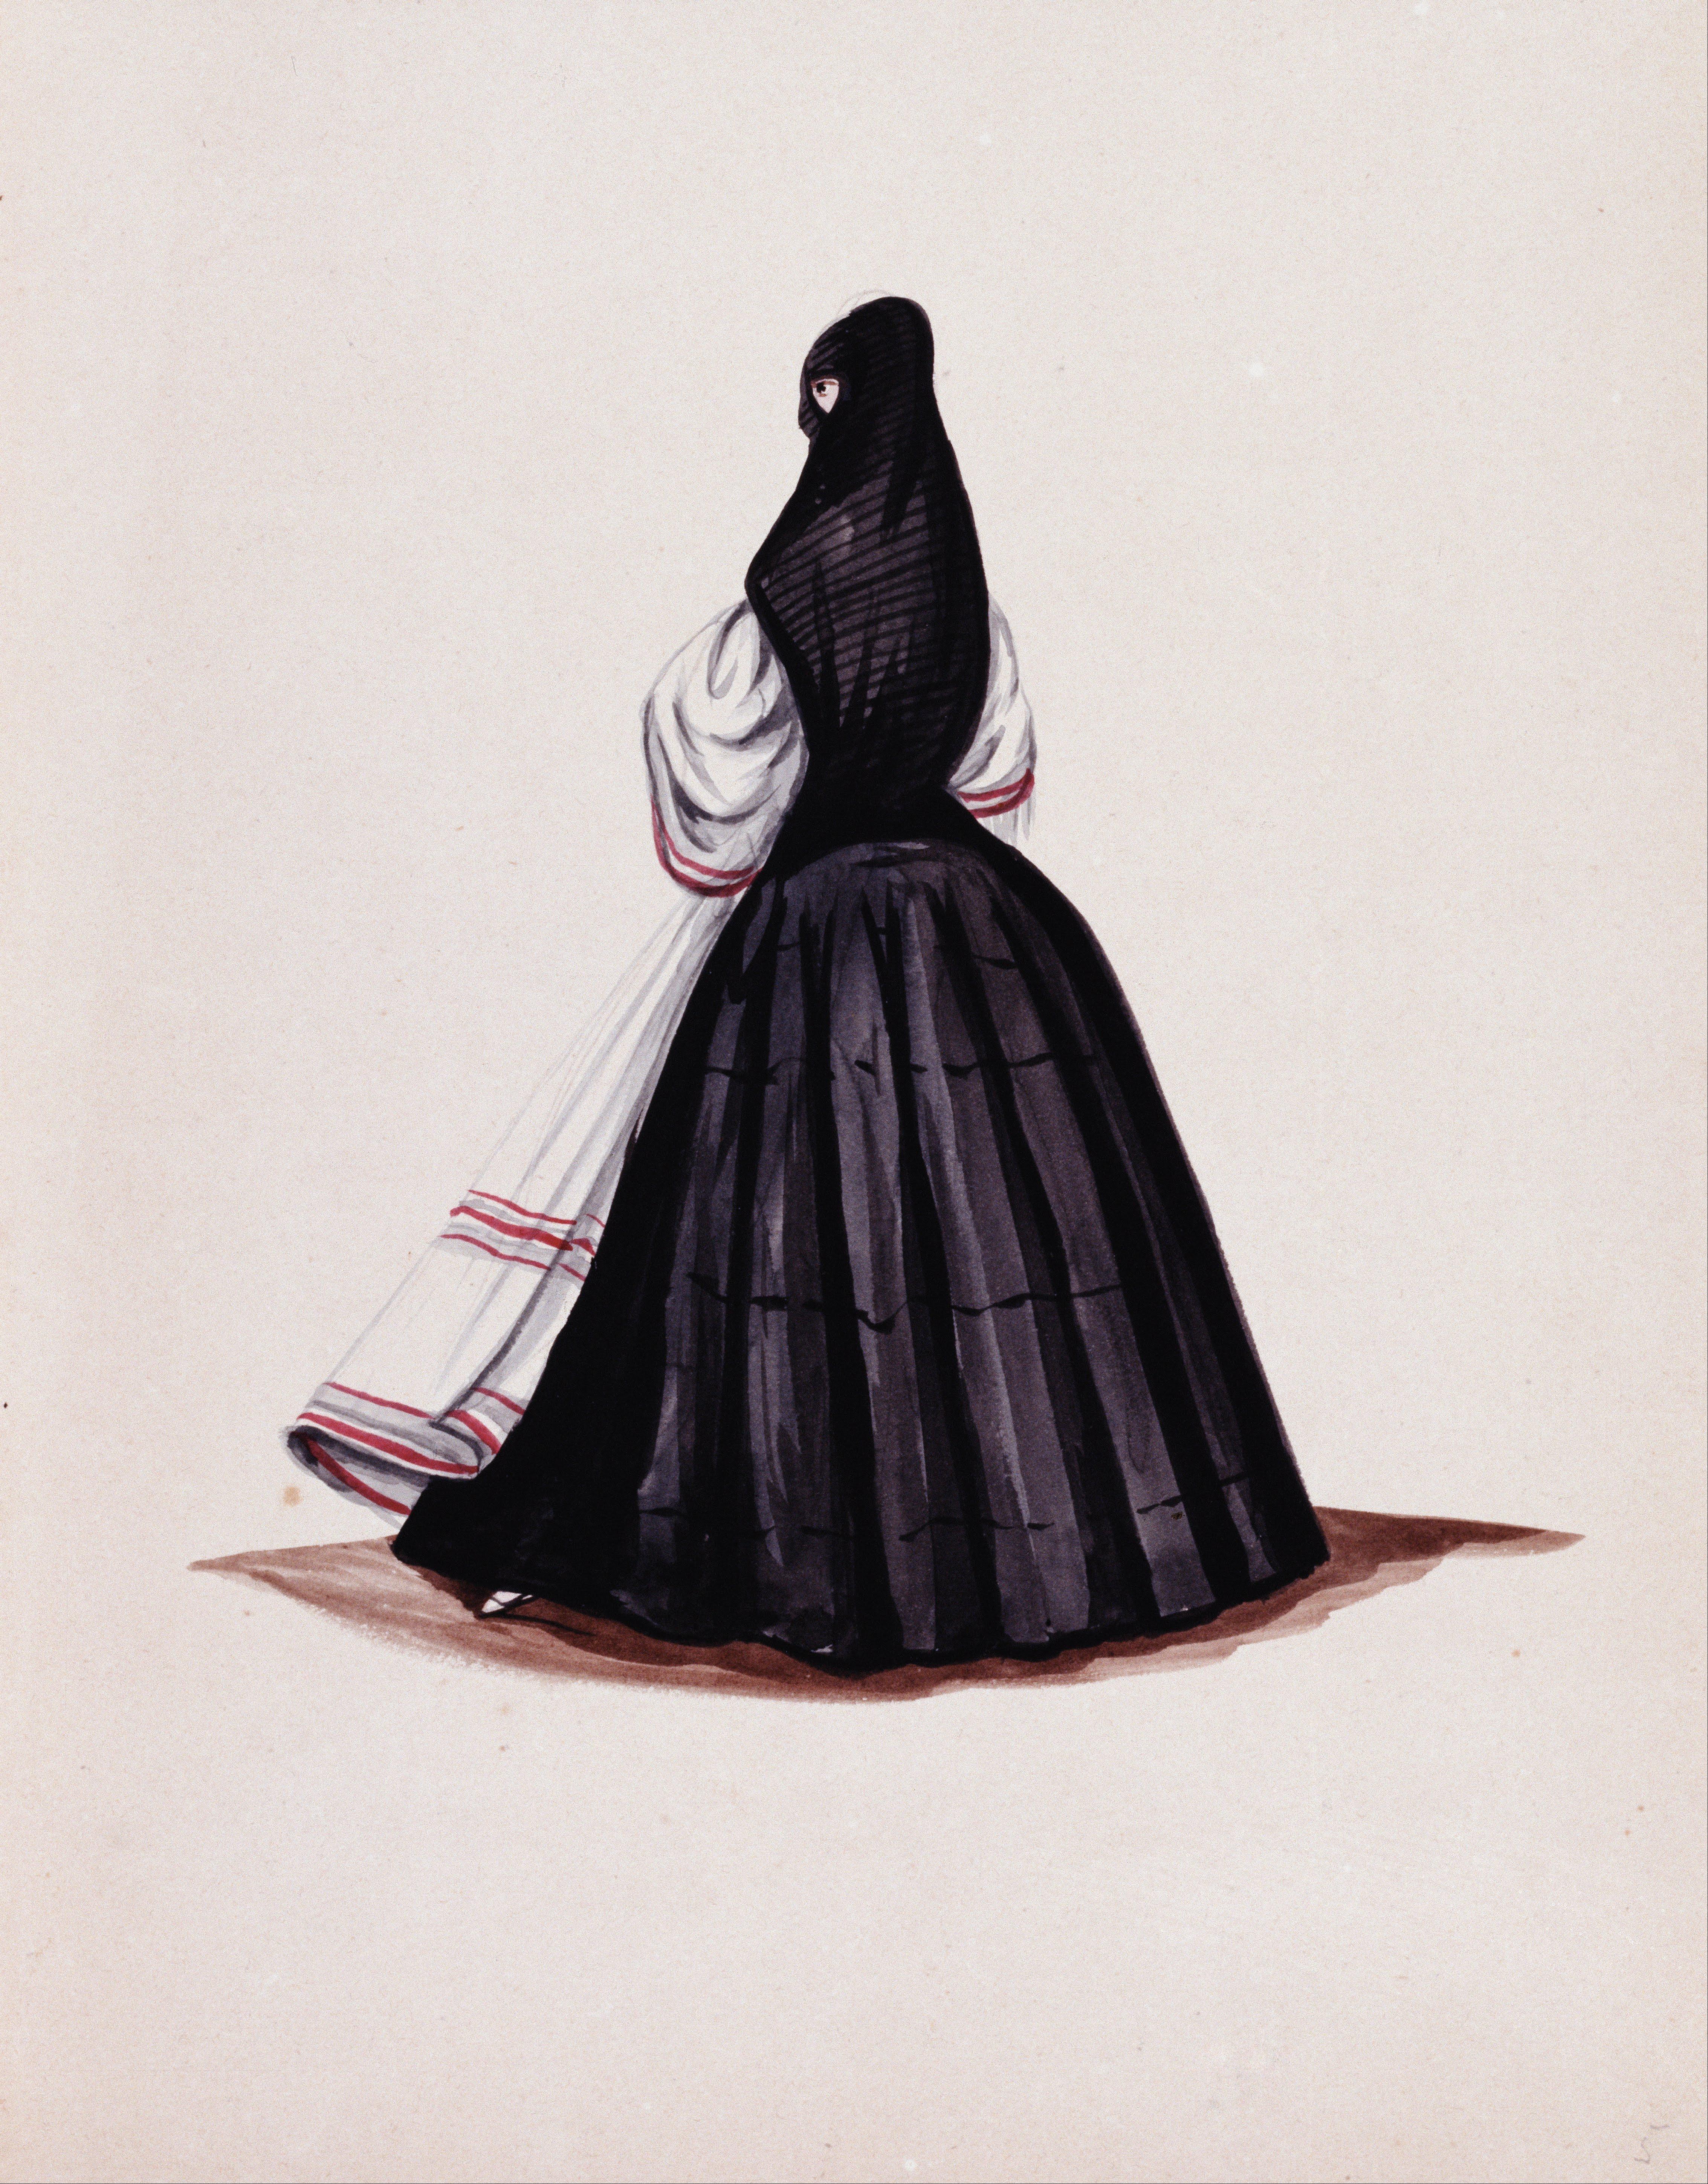 Archivo:Francisco Fierro - Tapada limeña - Google Art Project.jpg -  Wikipedia, la enciclopedia libre